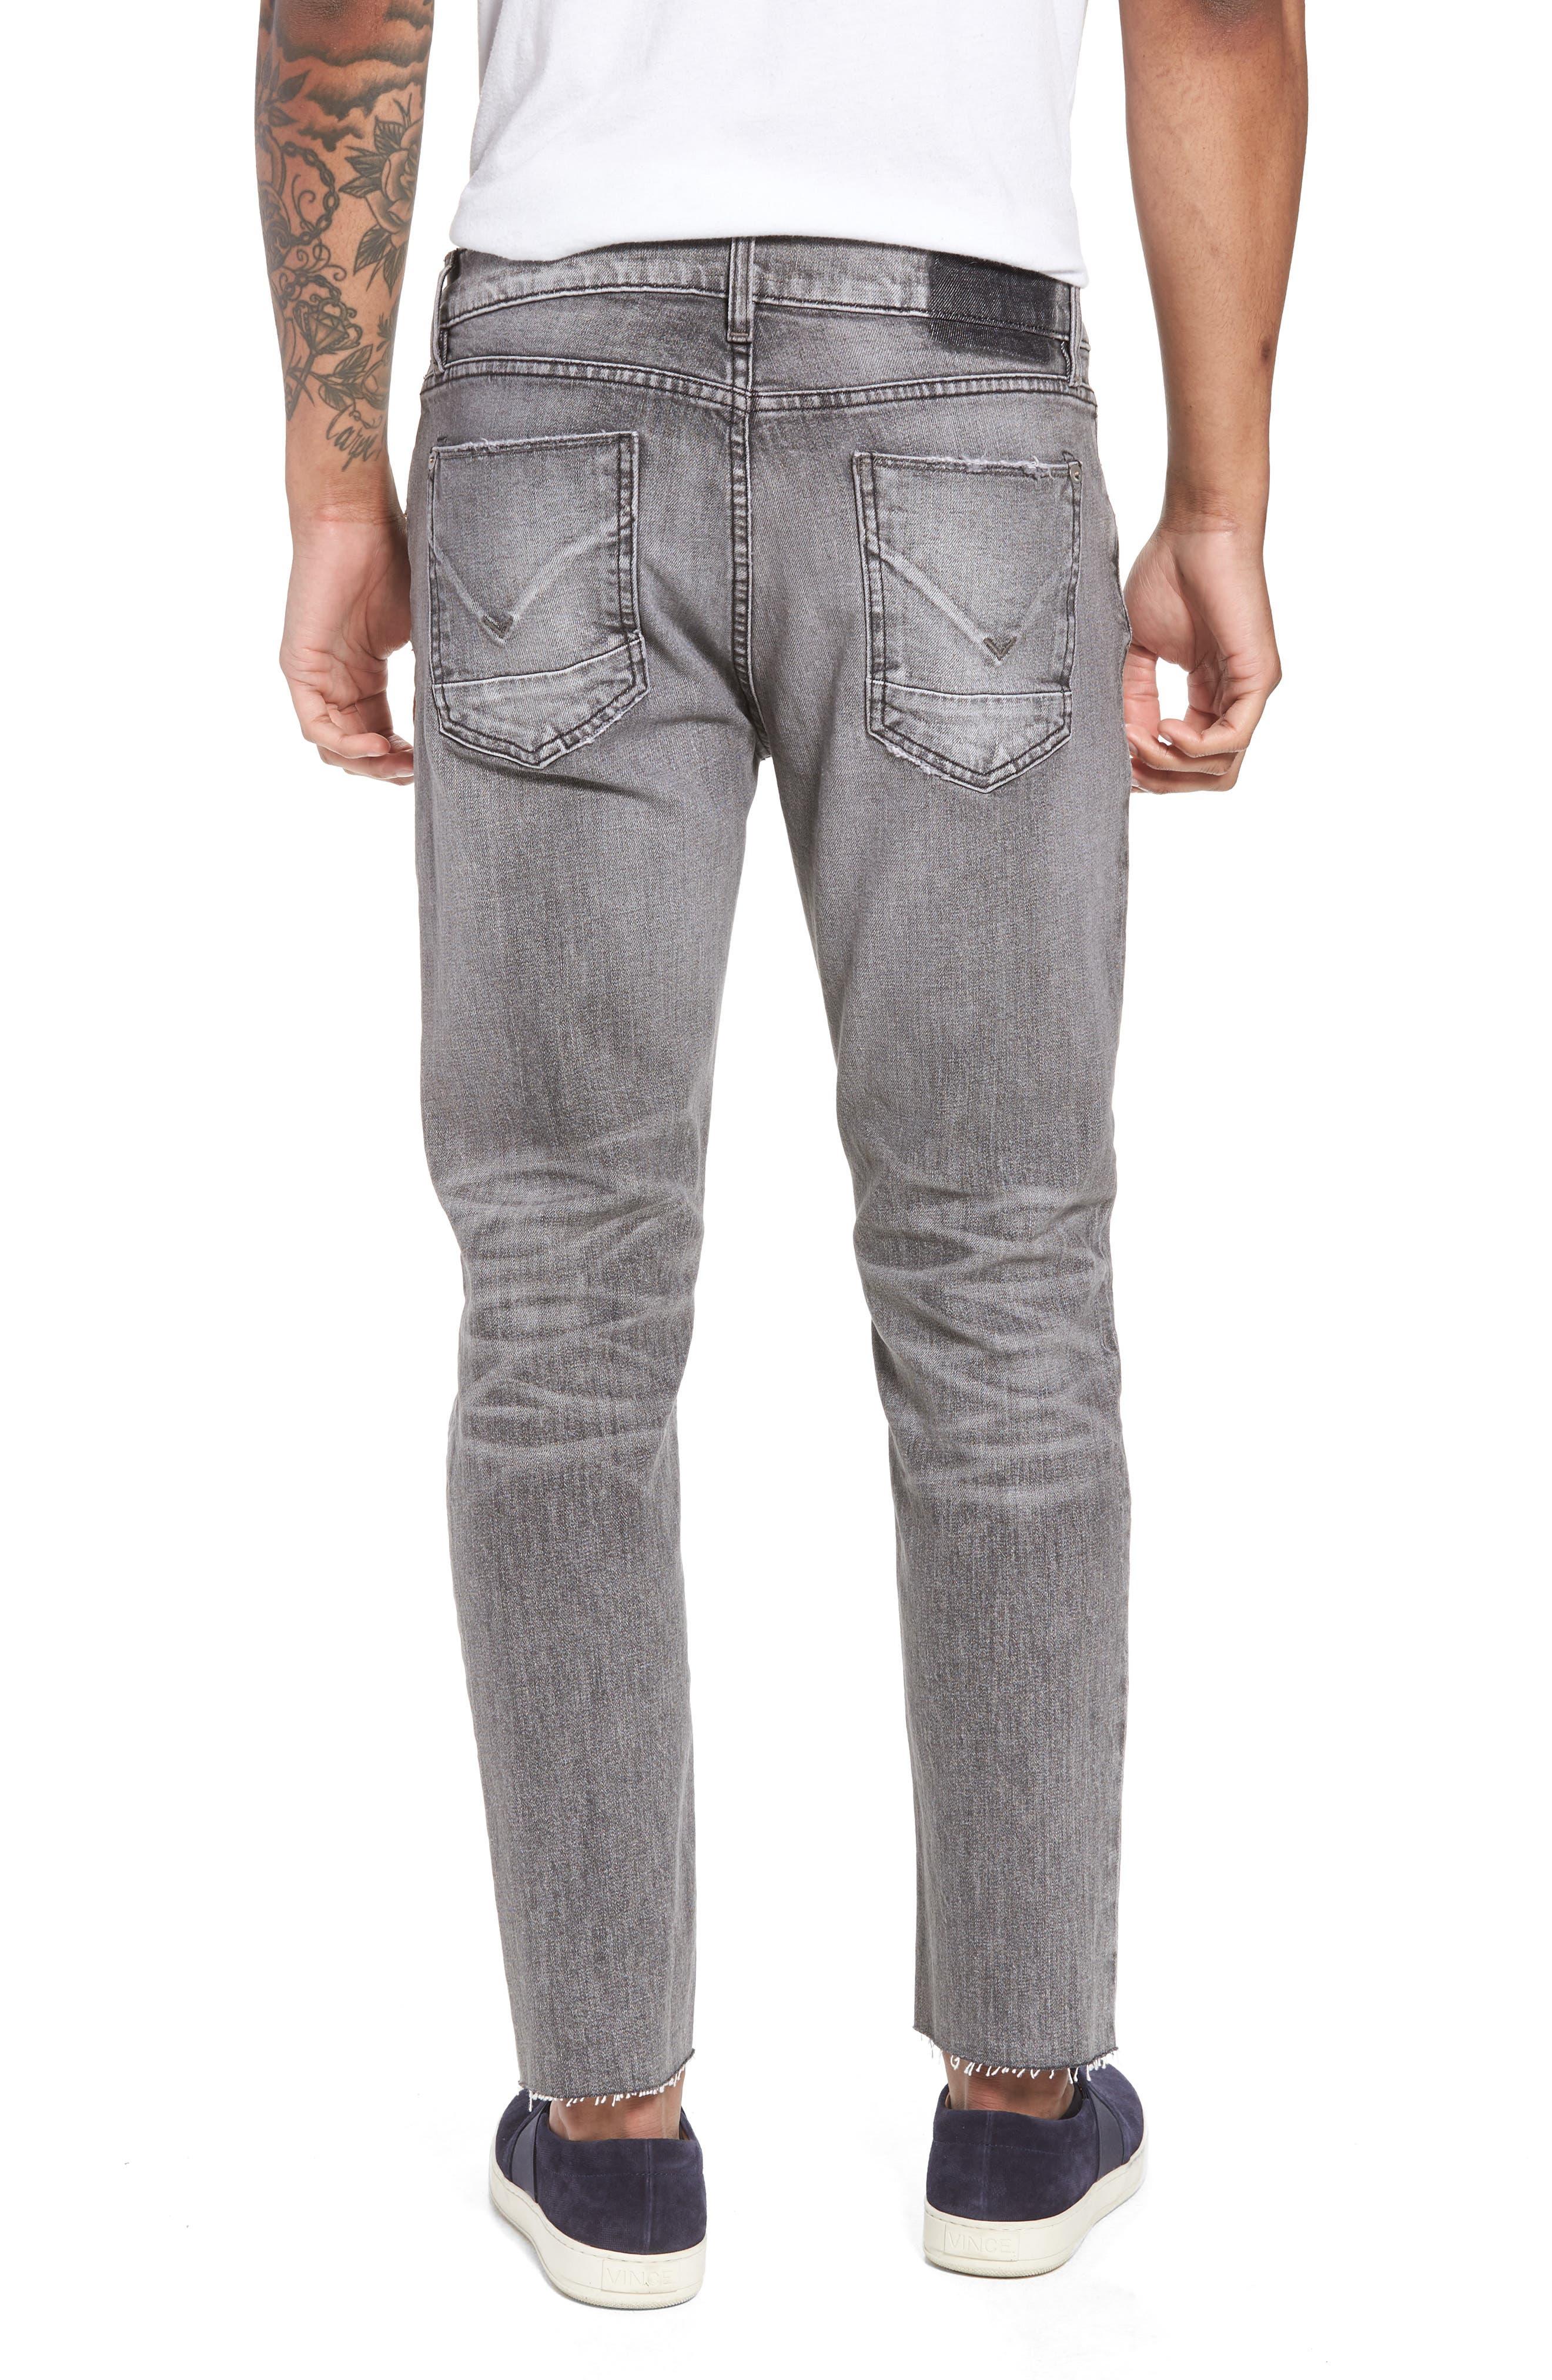 HUDSON JEANS,                             Blake Slim Fit Jeans,                             Alternate thumbnail 2, color,                             063